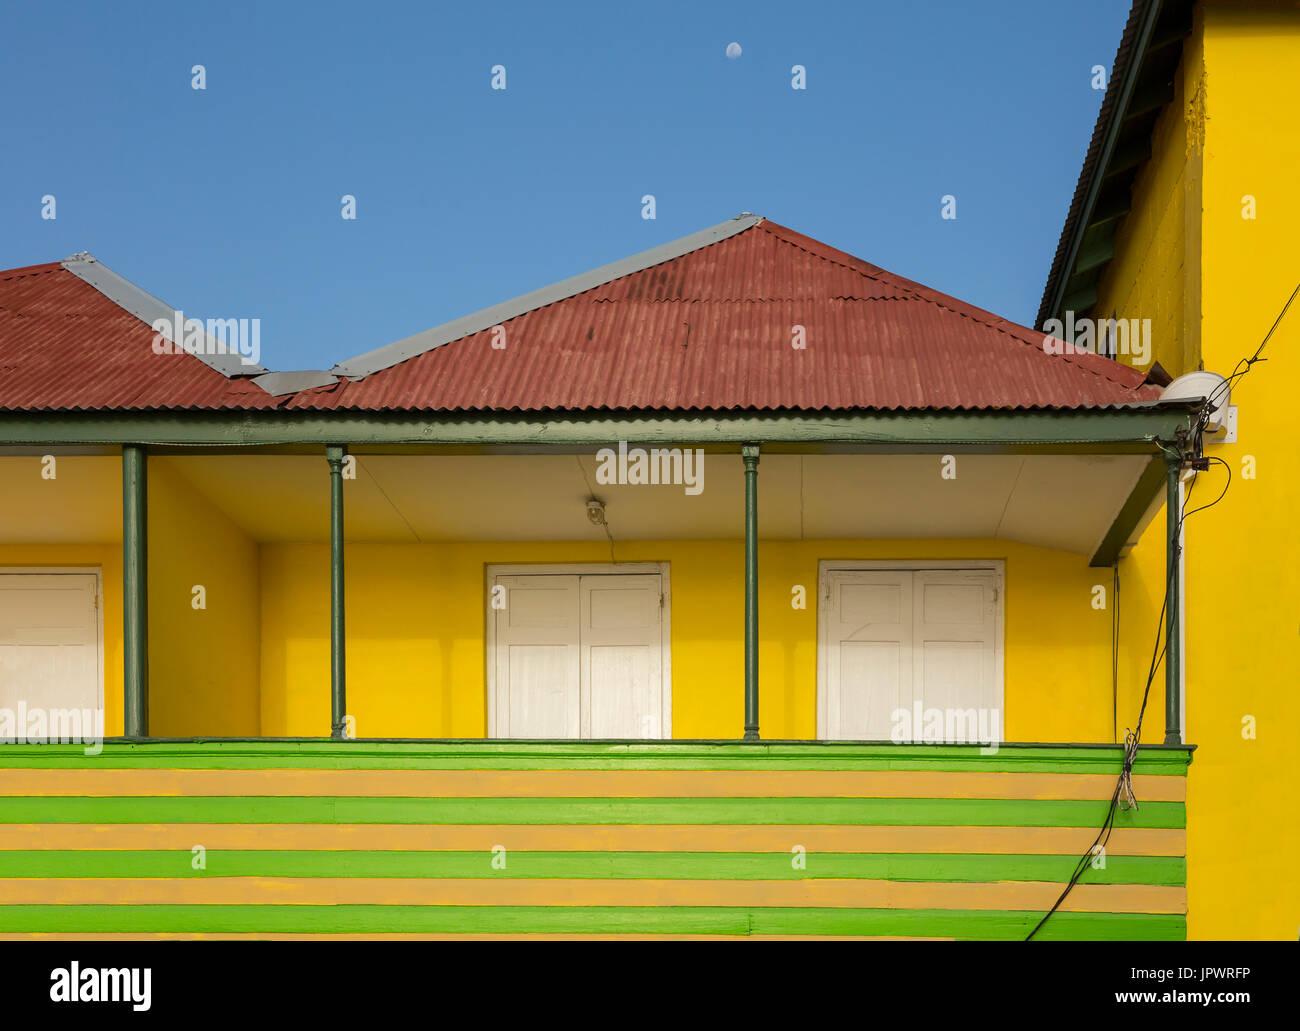 Yellow Corrugated Iron Roof Stock Photos Amp Yellow